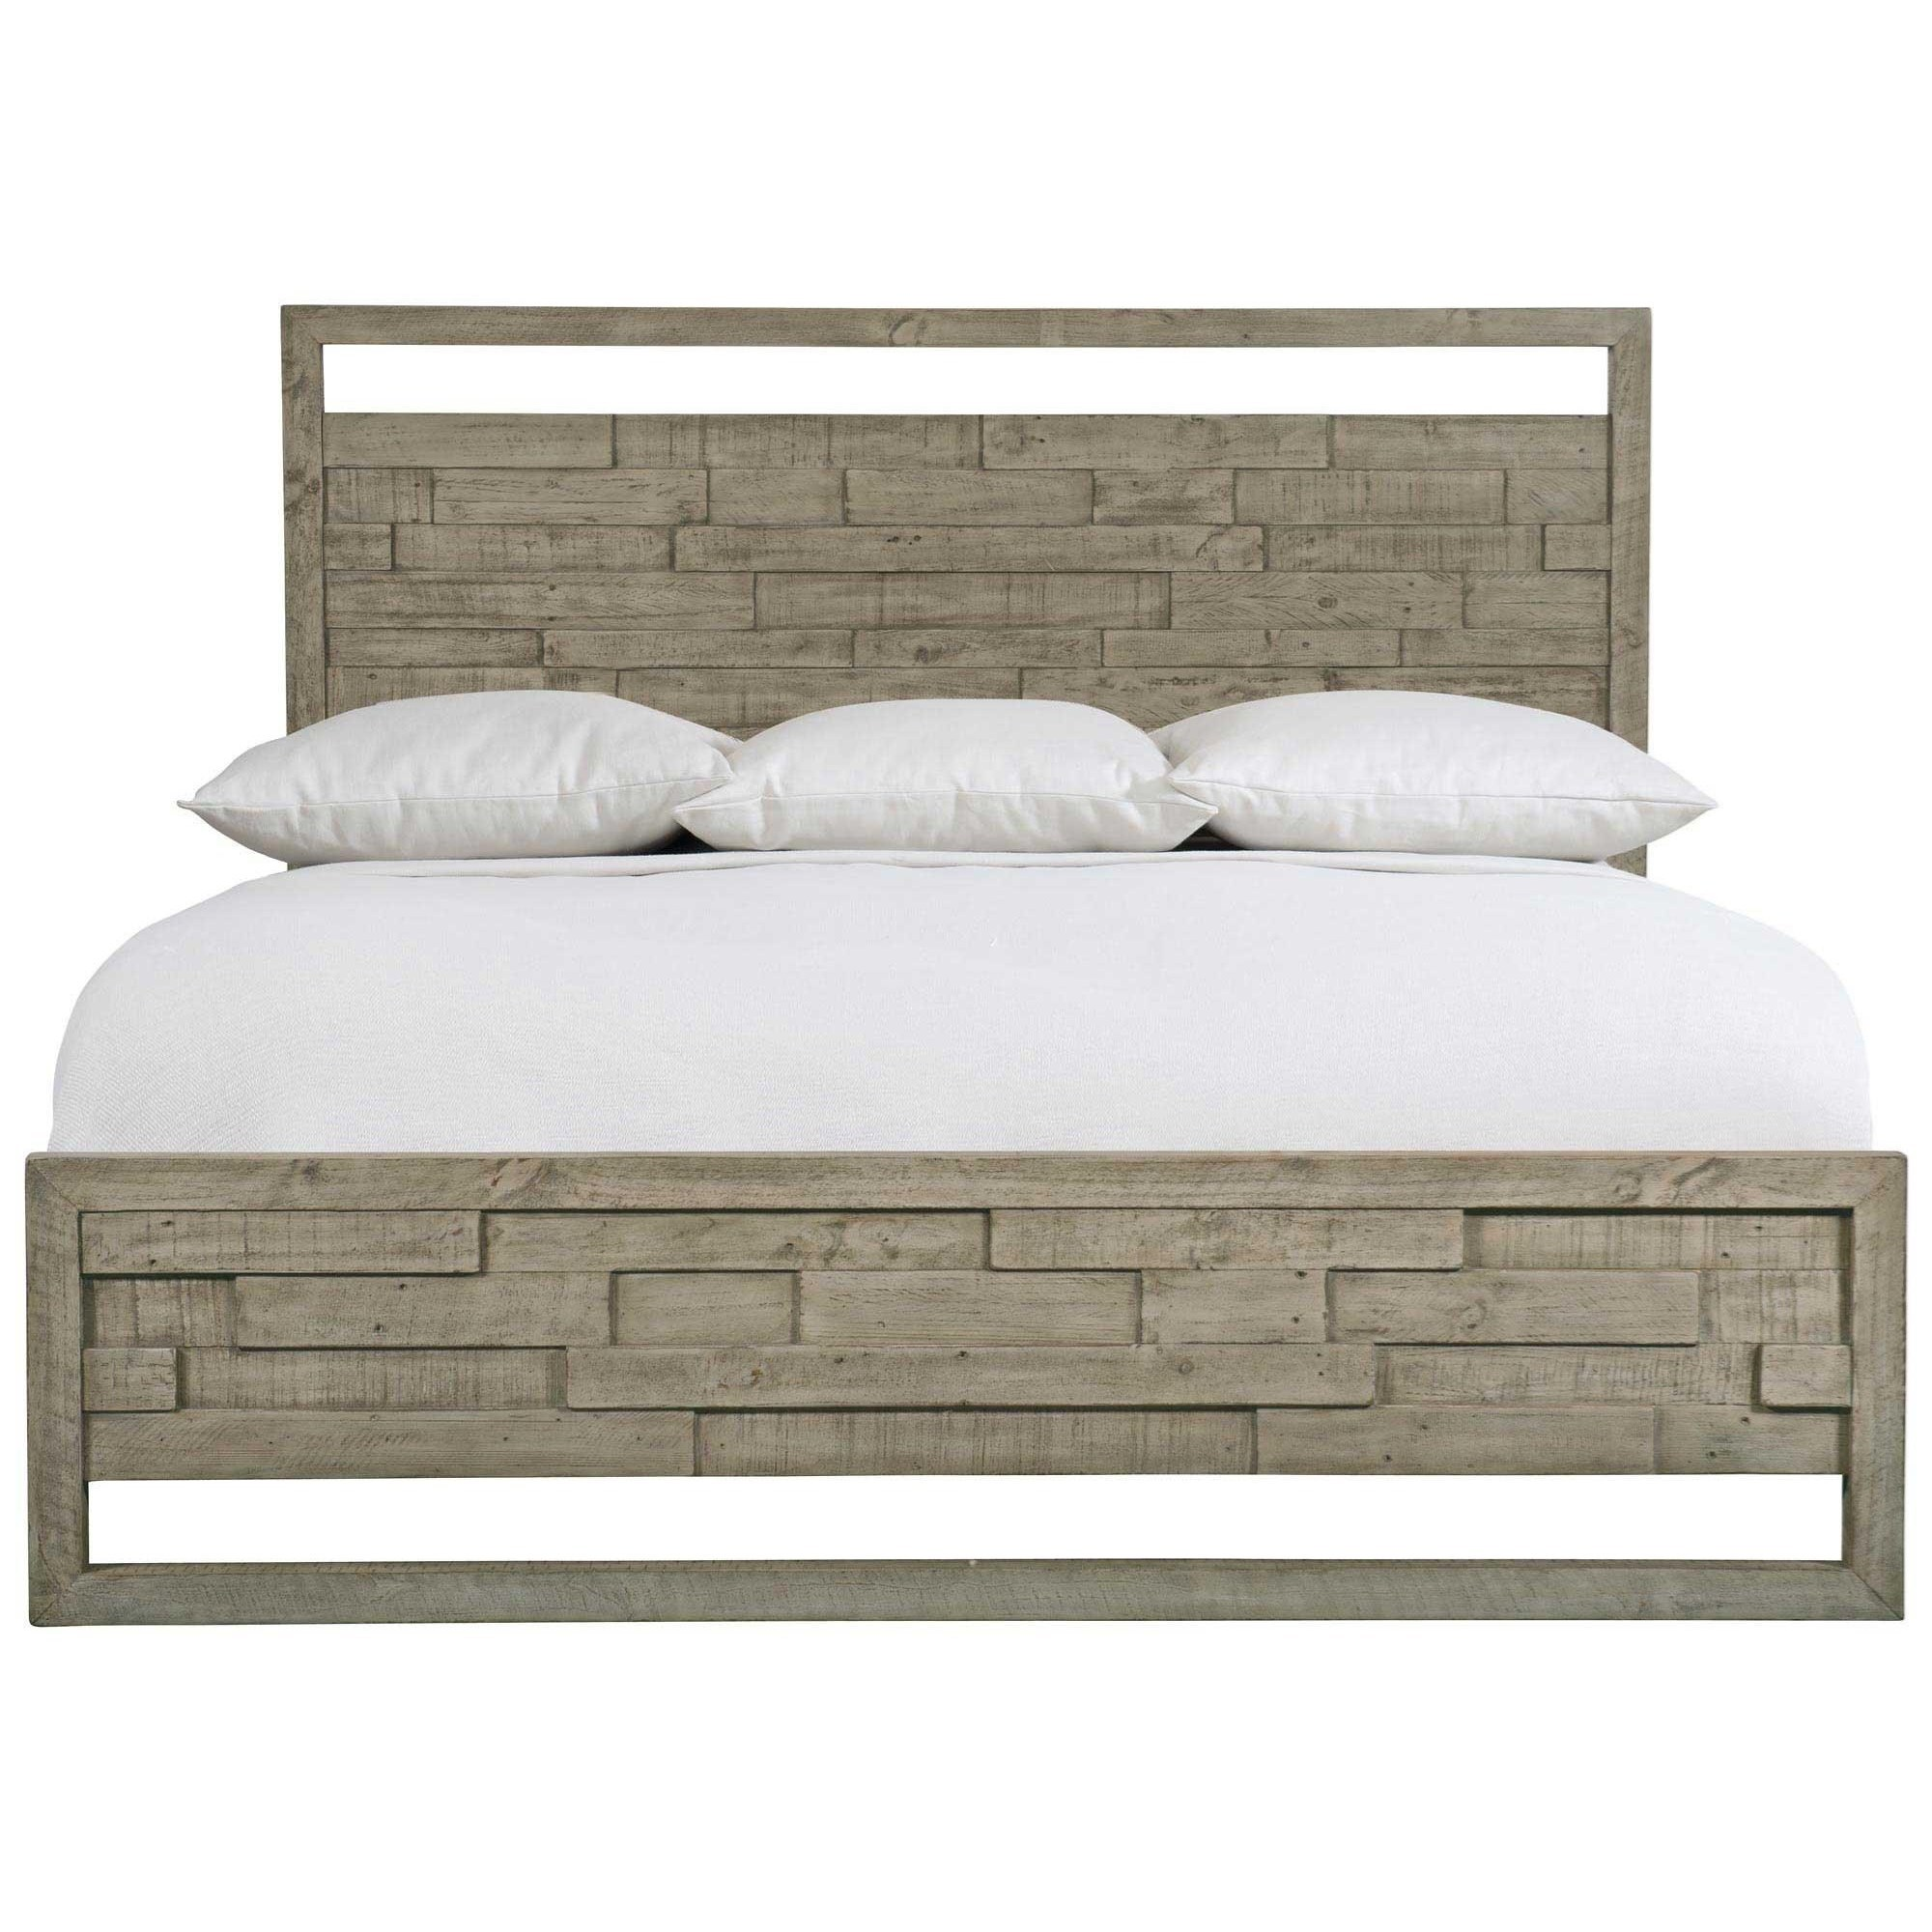 Loft - Highland Park Shaw Queen Panel Bed by Bernhardt at Baer's Furniture